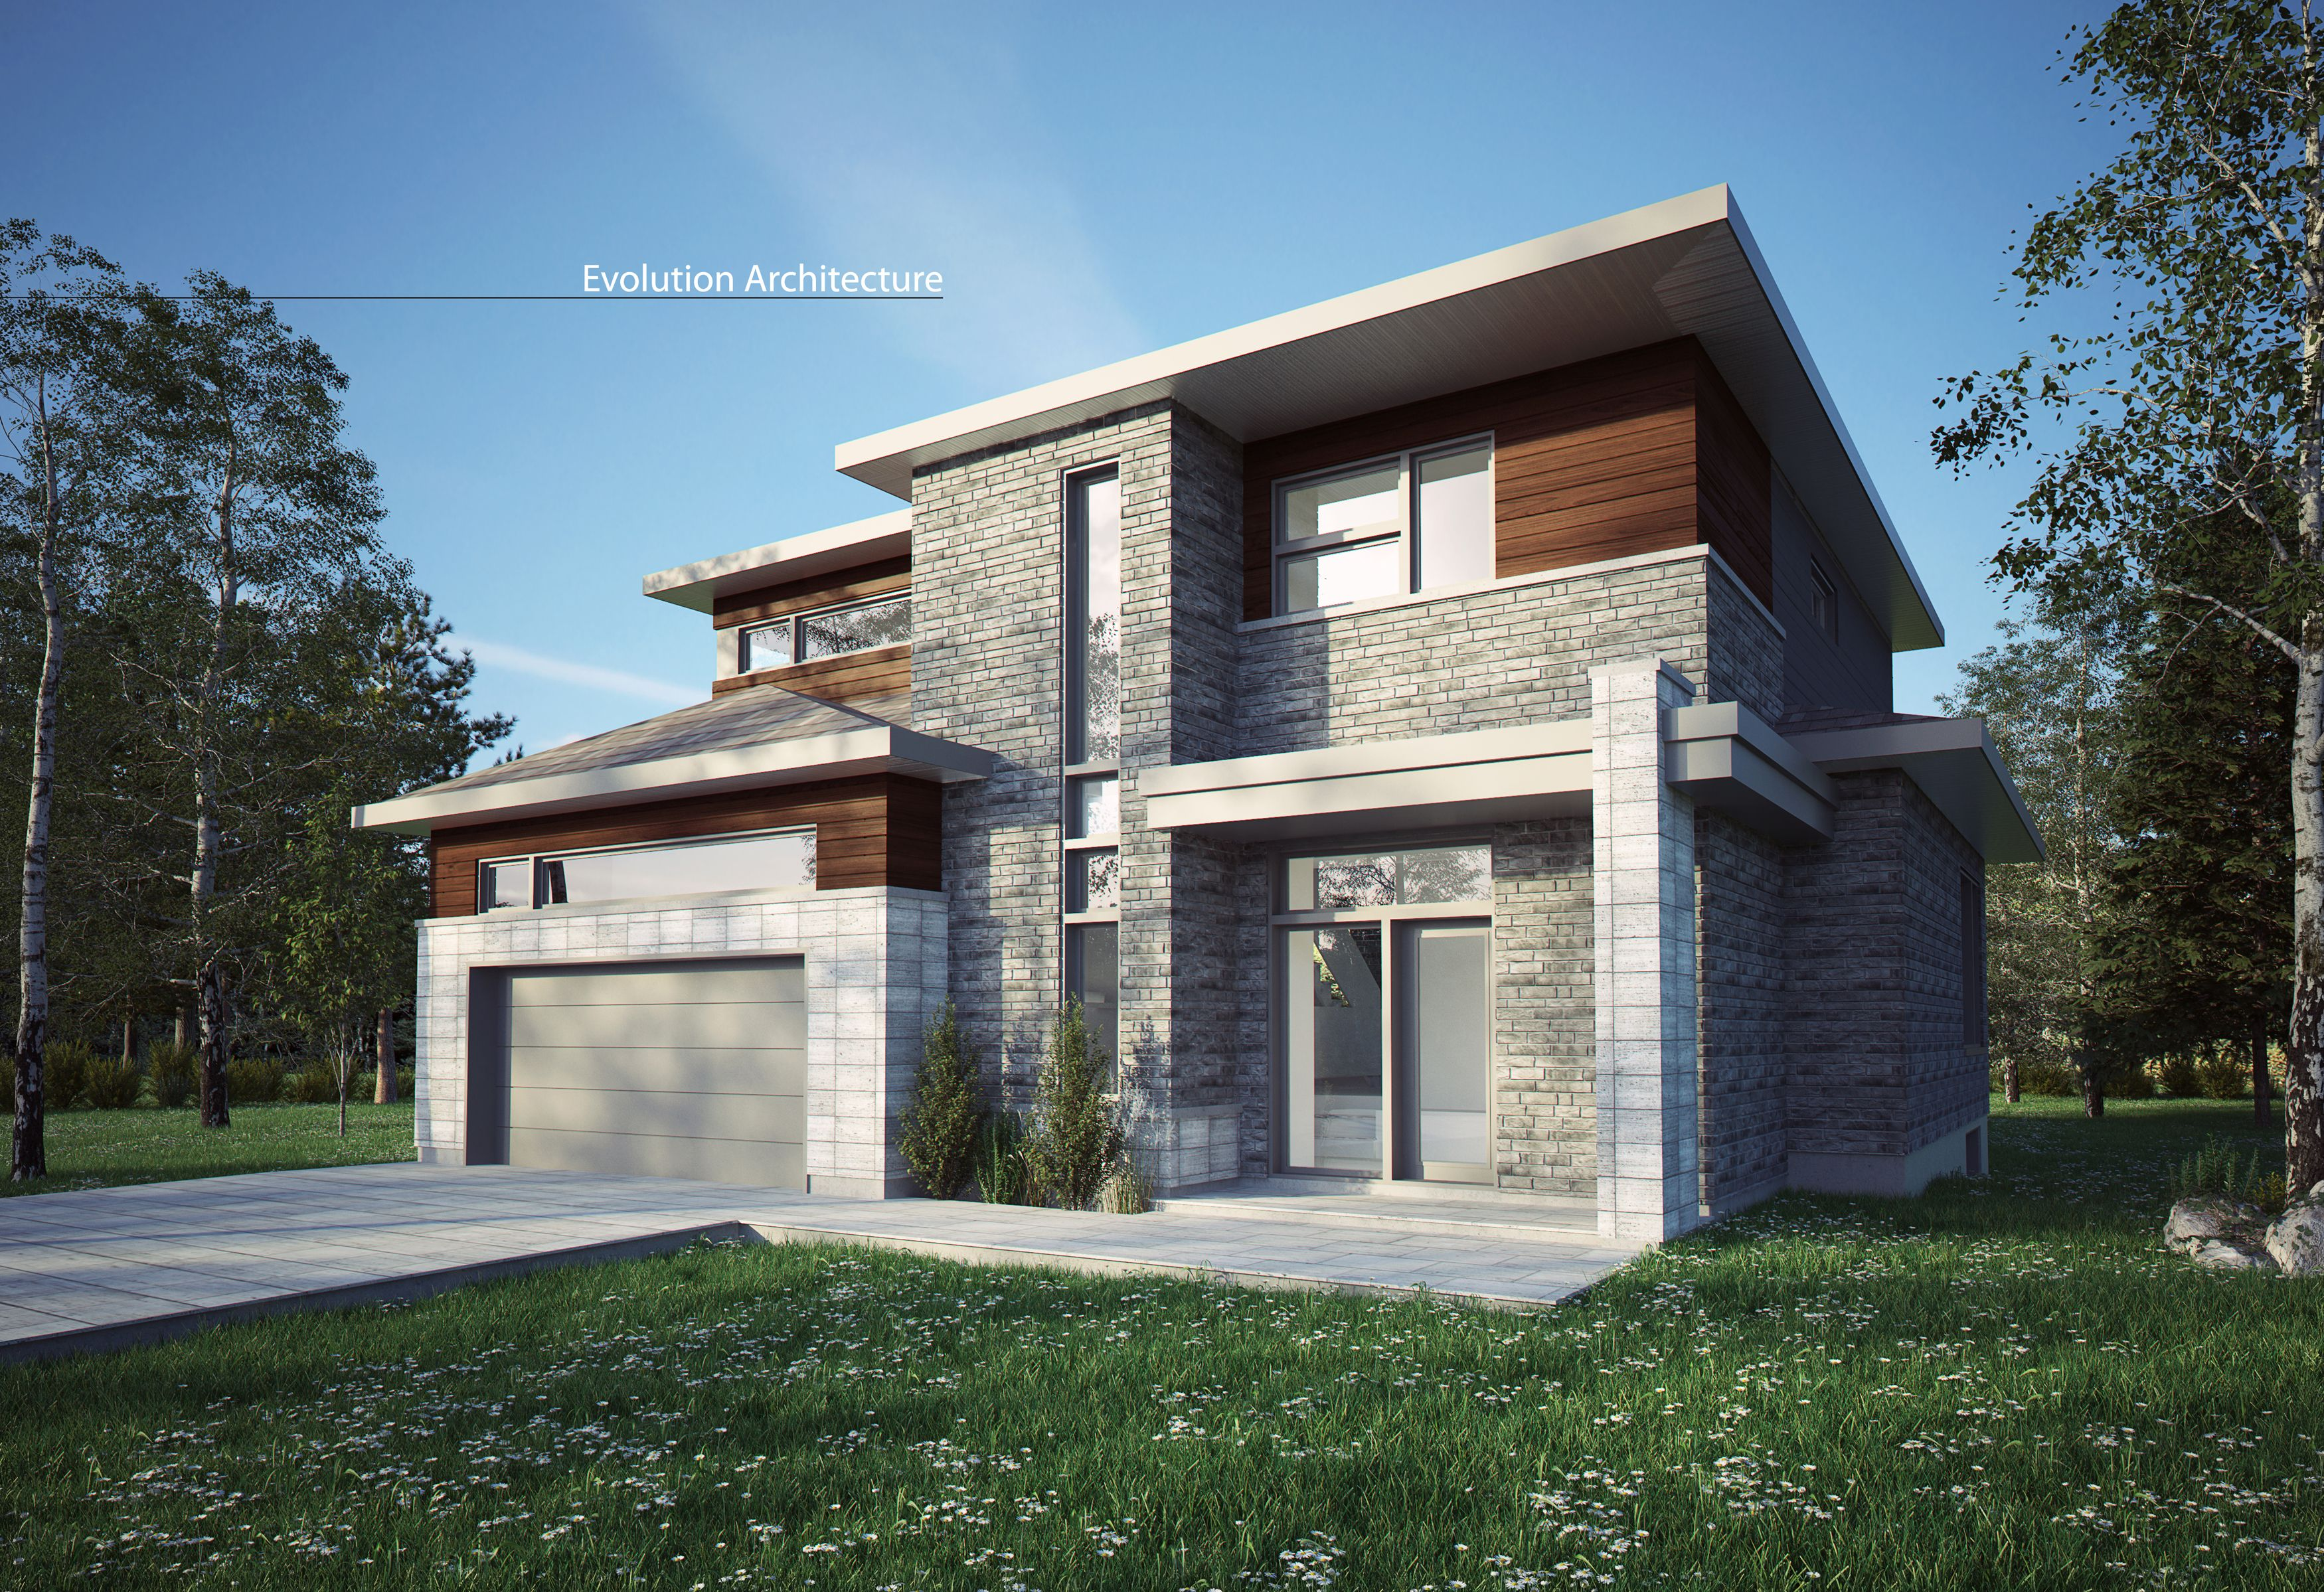 Architecture maison contemporaine cr ation exclusive e for Architecture moderne maison